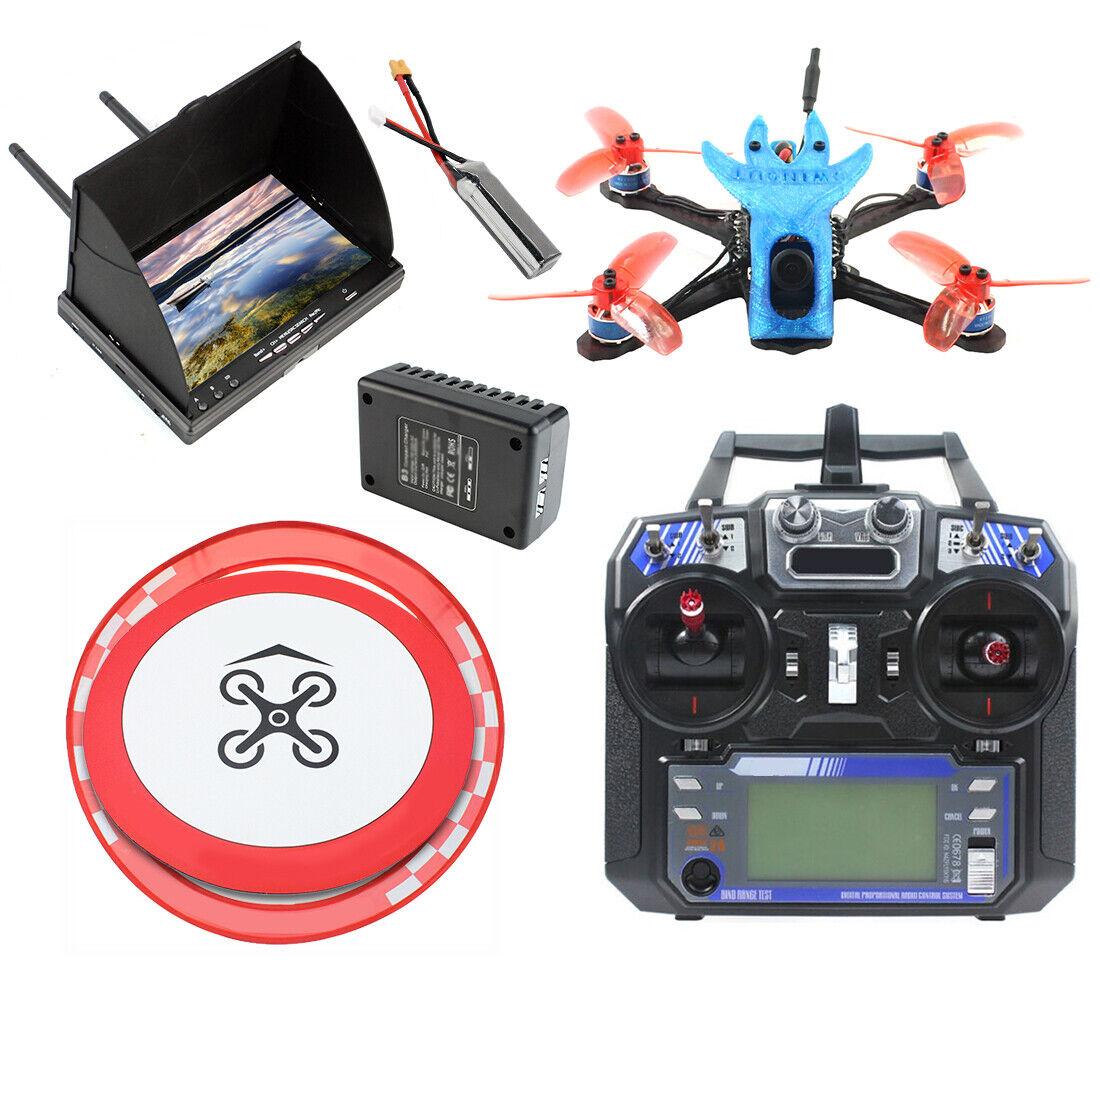 acquista online oggi QWinOut FPV Racing Drone Flycielo FS I6 I6 I6 Transmitter FS-A8S Receiver FPV Display  prodotti creativi